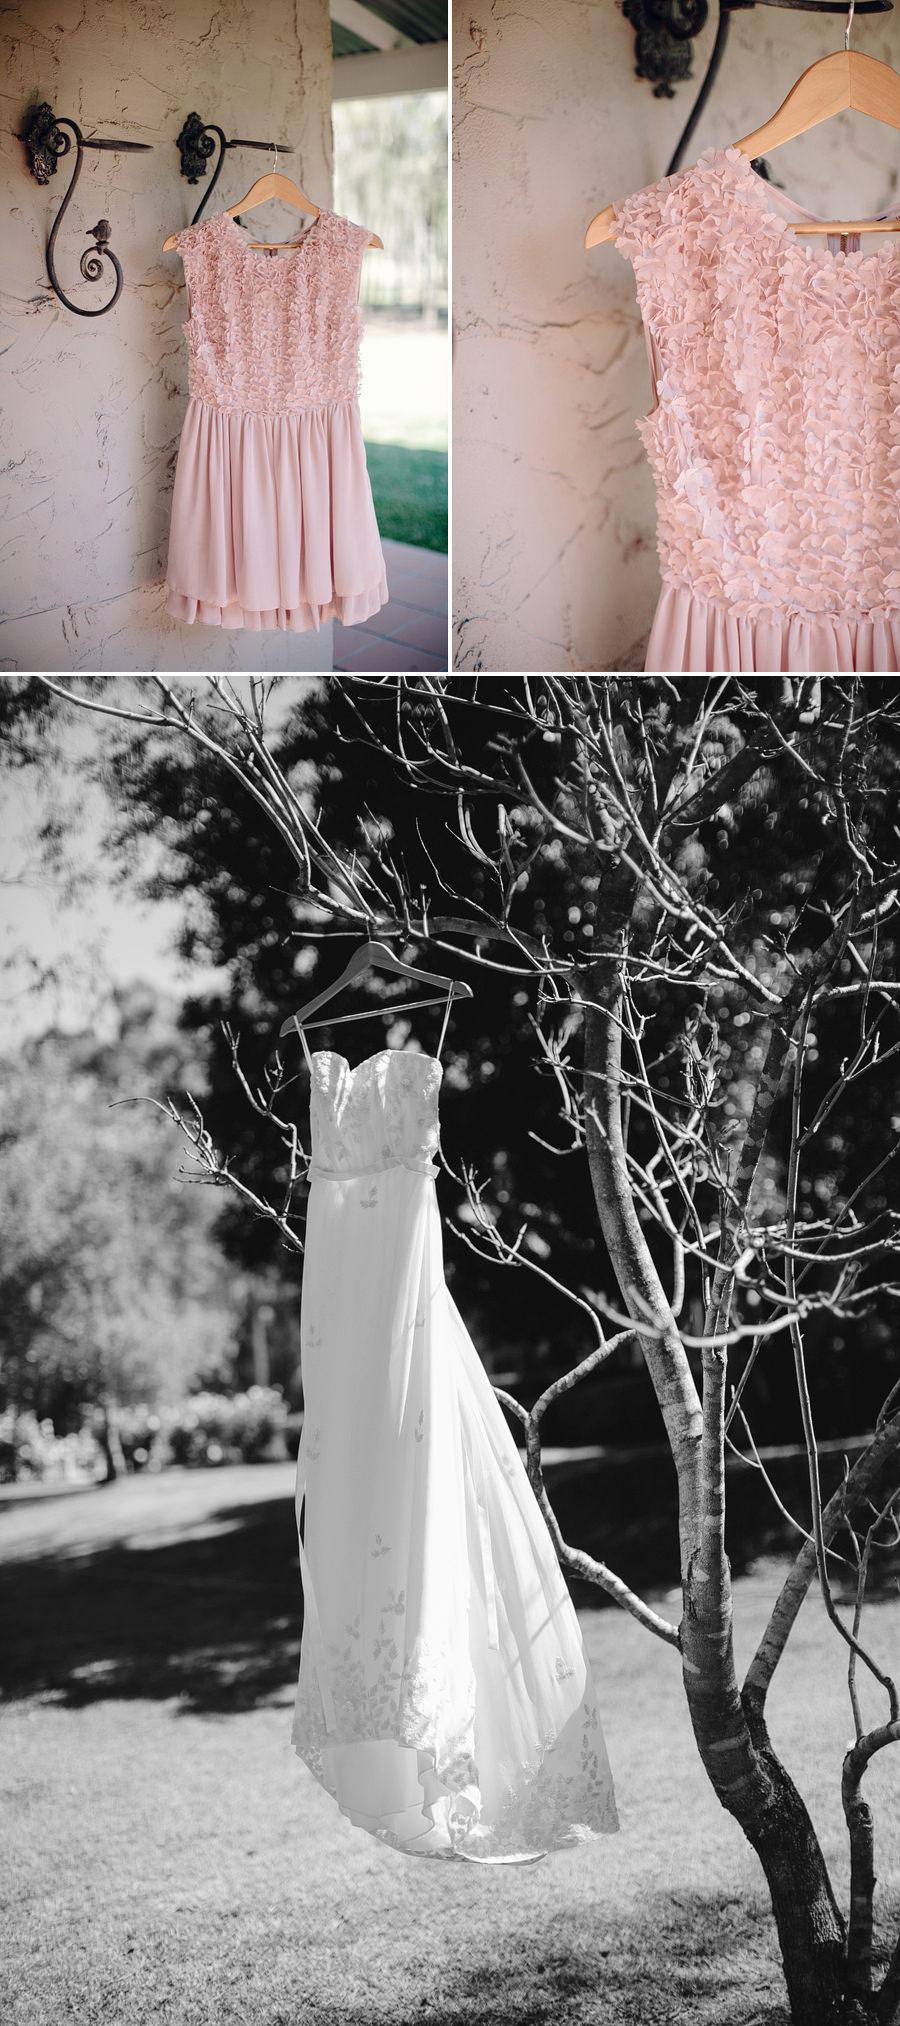 Thistle Hill Wedding Photographer: Wedding dress hanging in tree